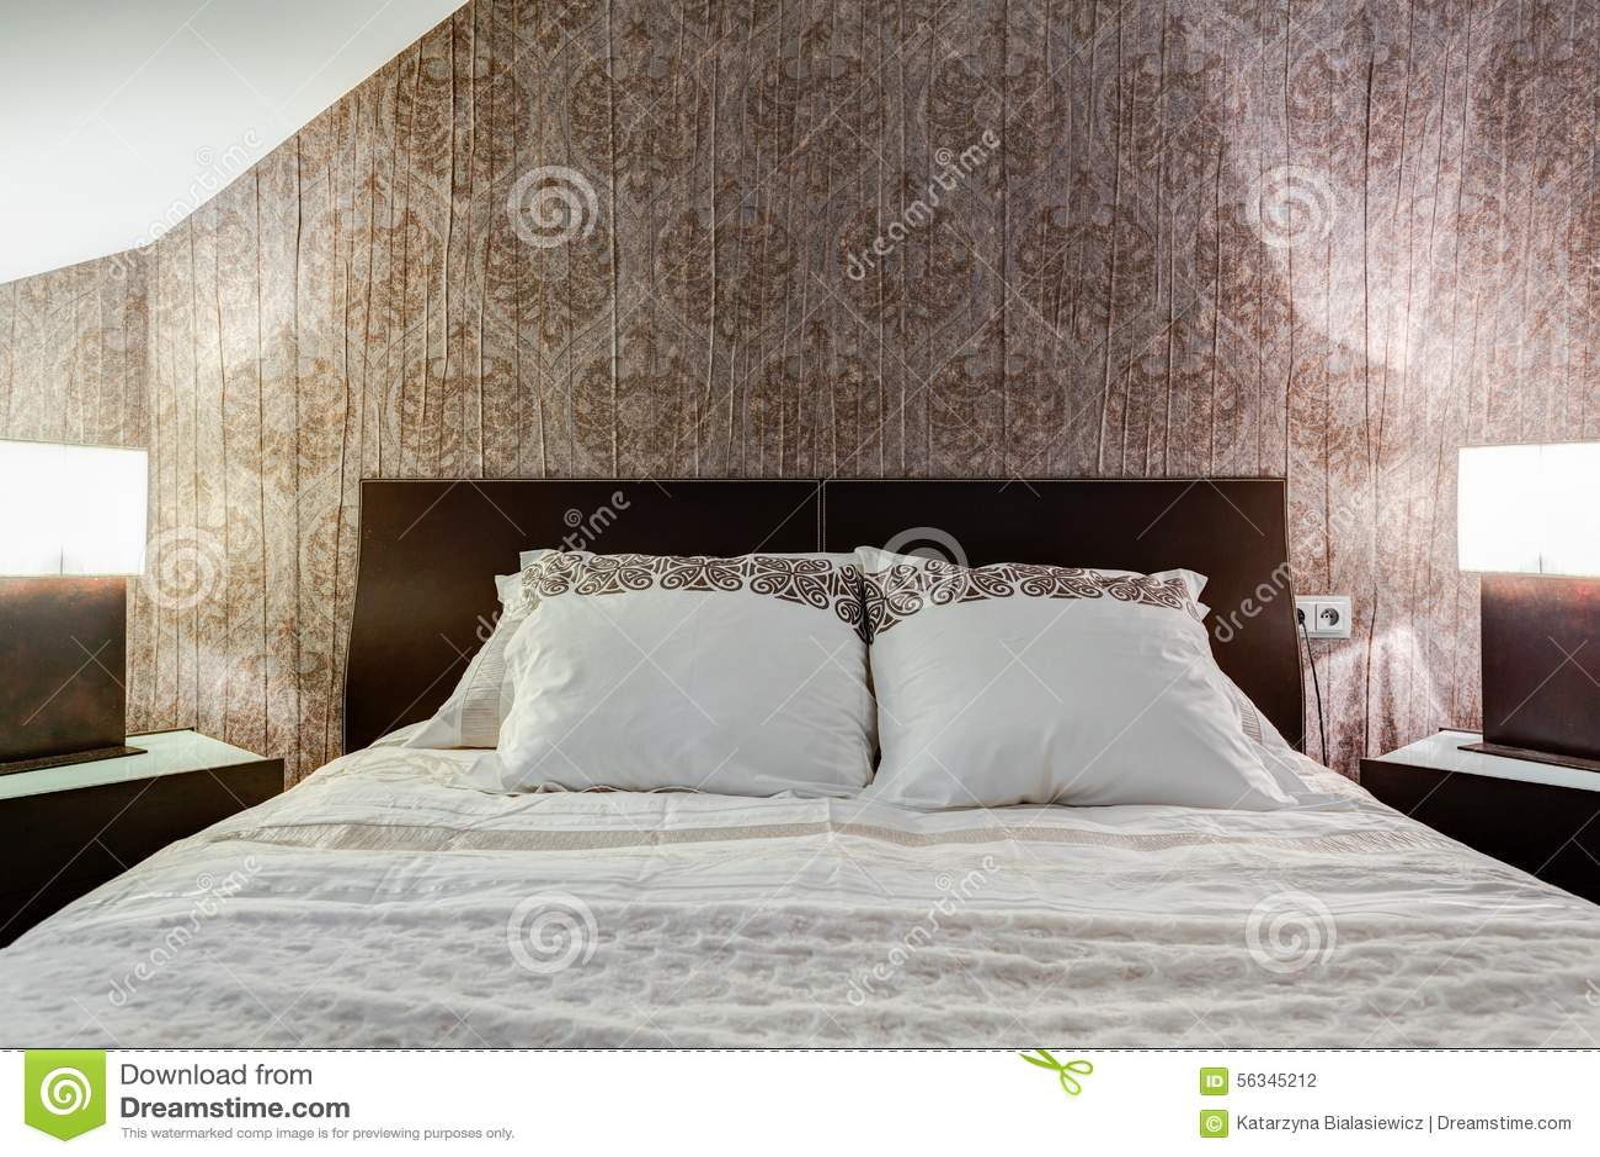 Brun Tapet I Elegant Sovrum Arkivfoto - Bild: 56345212